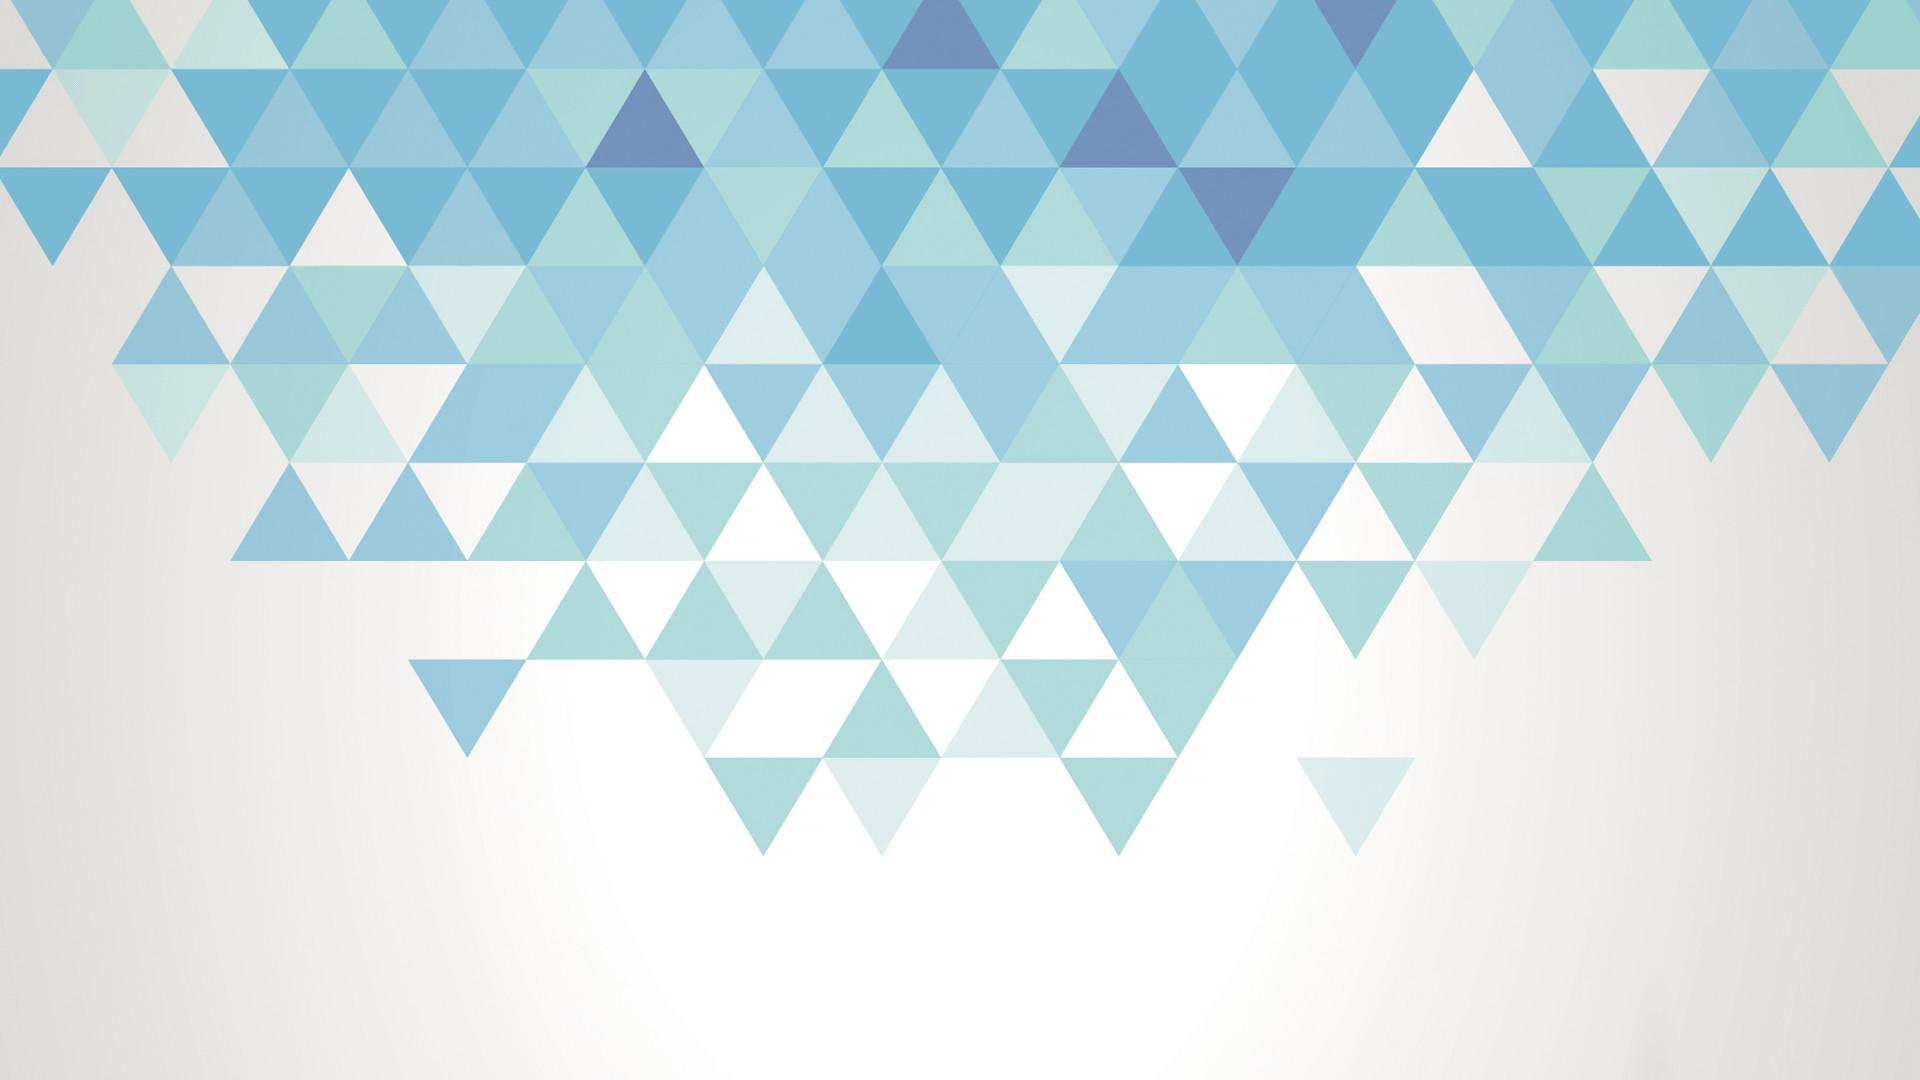 Marketing Wallpaper (76+ images)